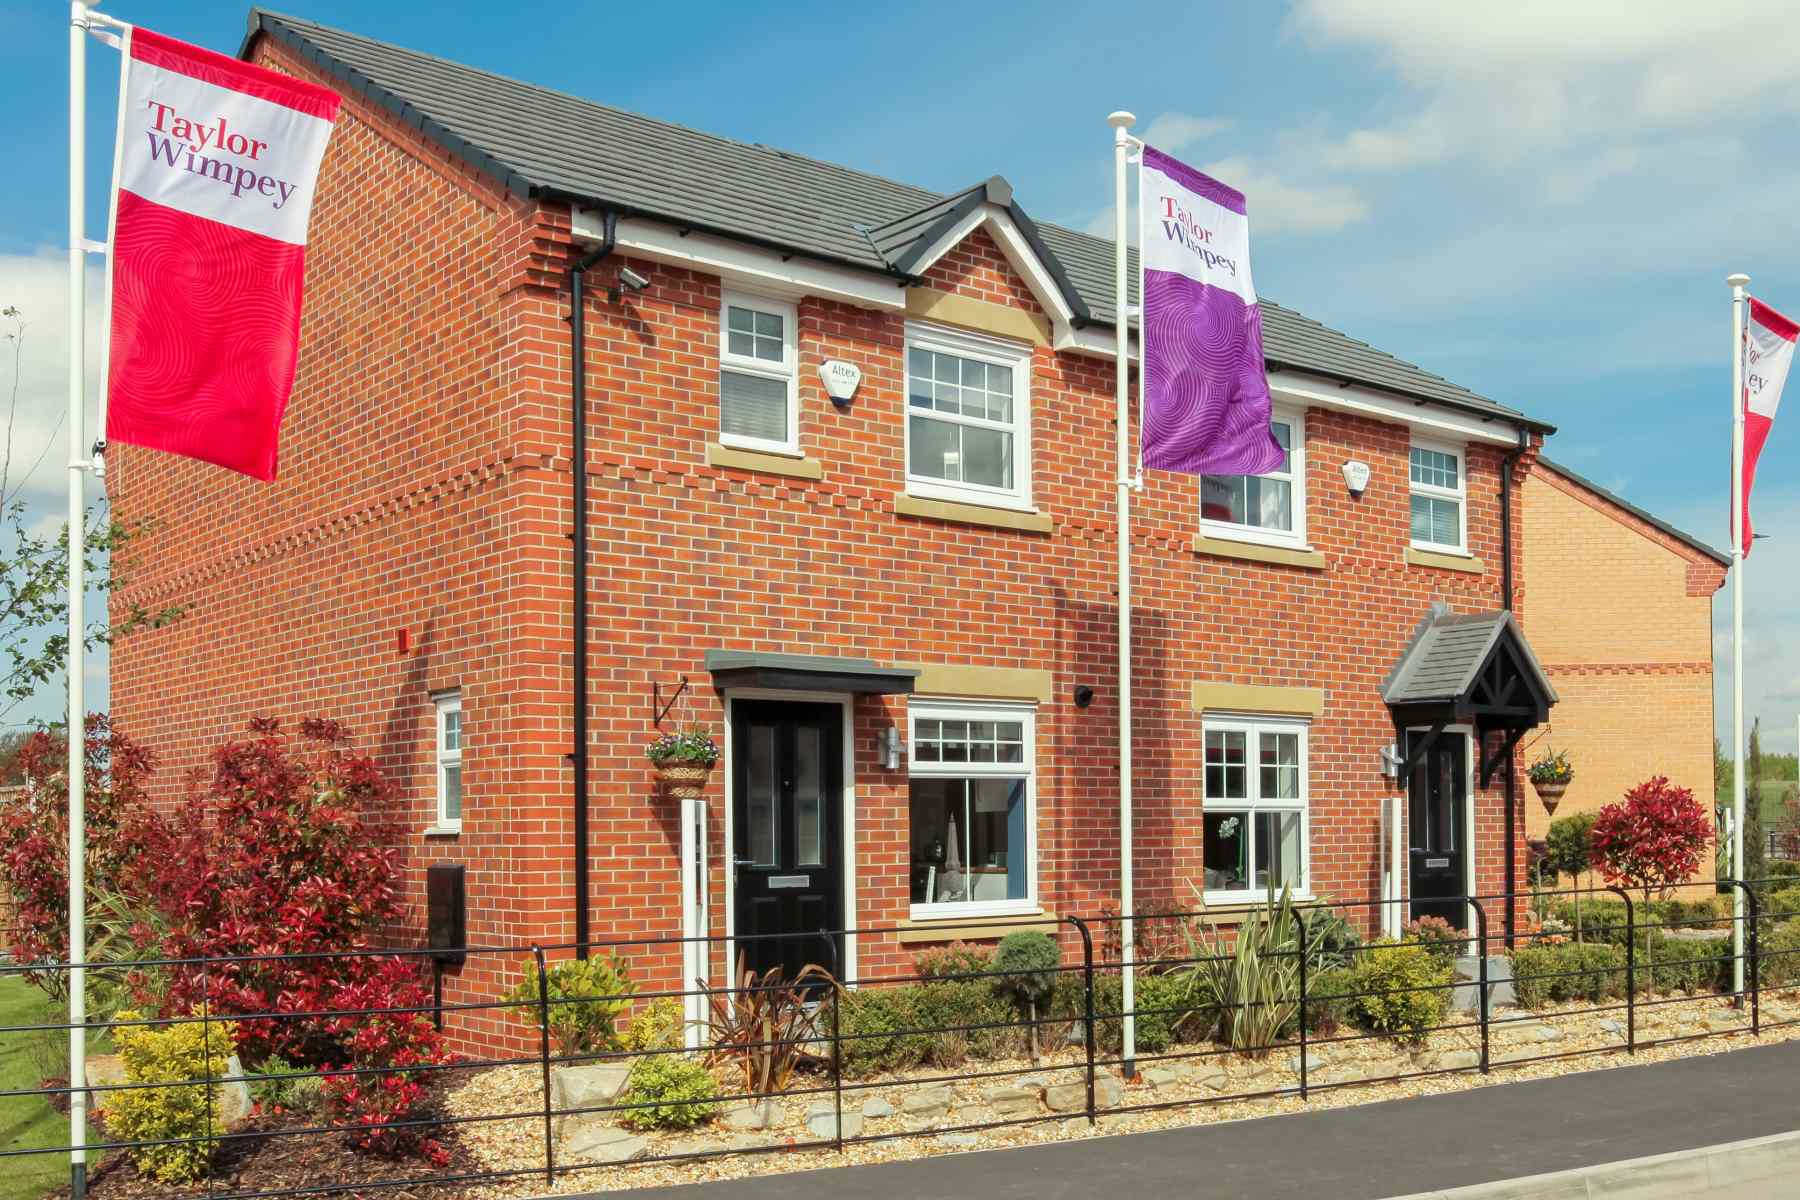 Sutton Grange New Homes In Shrewsbury Taylor Wimpey